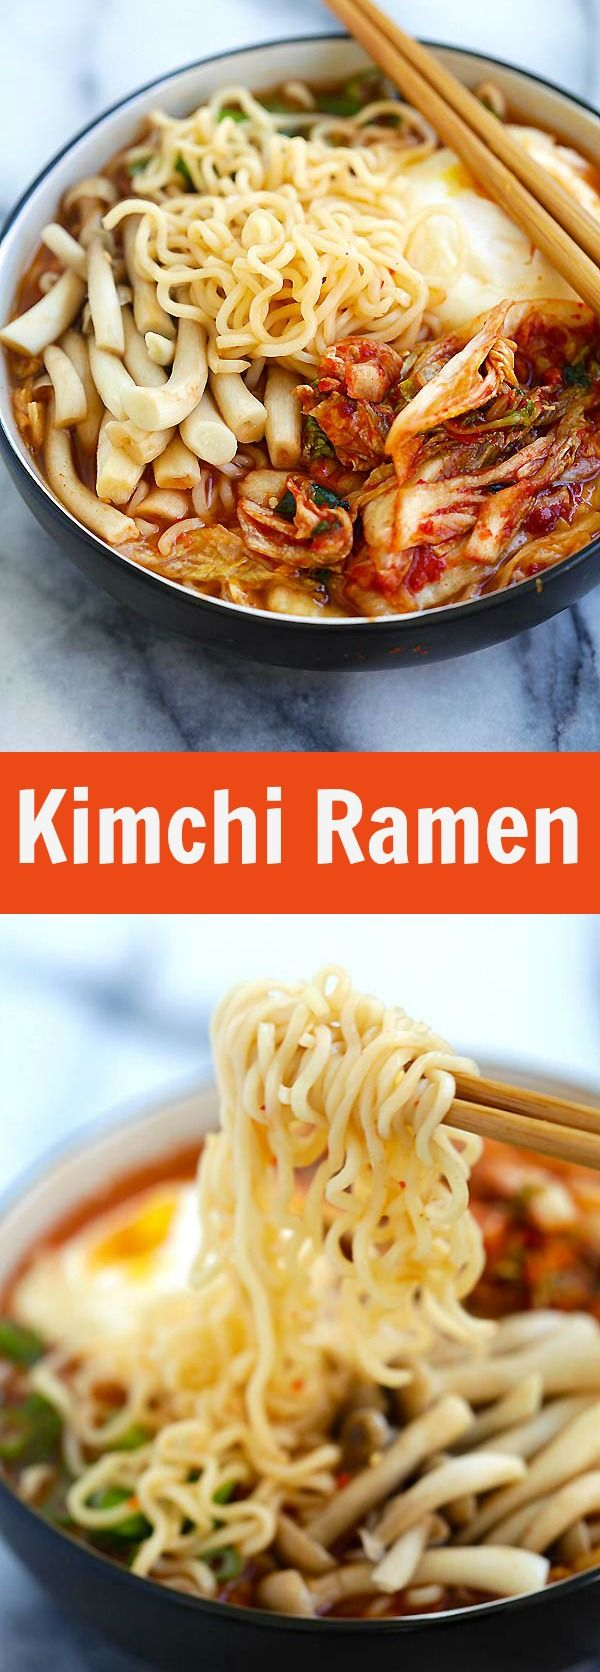 Kimchi Ramen – spicy Korean ramen with kimchi, mushroom and poached egg. Easy kimchi ramen recipe that takes only 15 mins to make | rasamalaysia.com